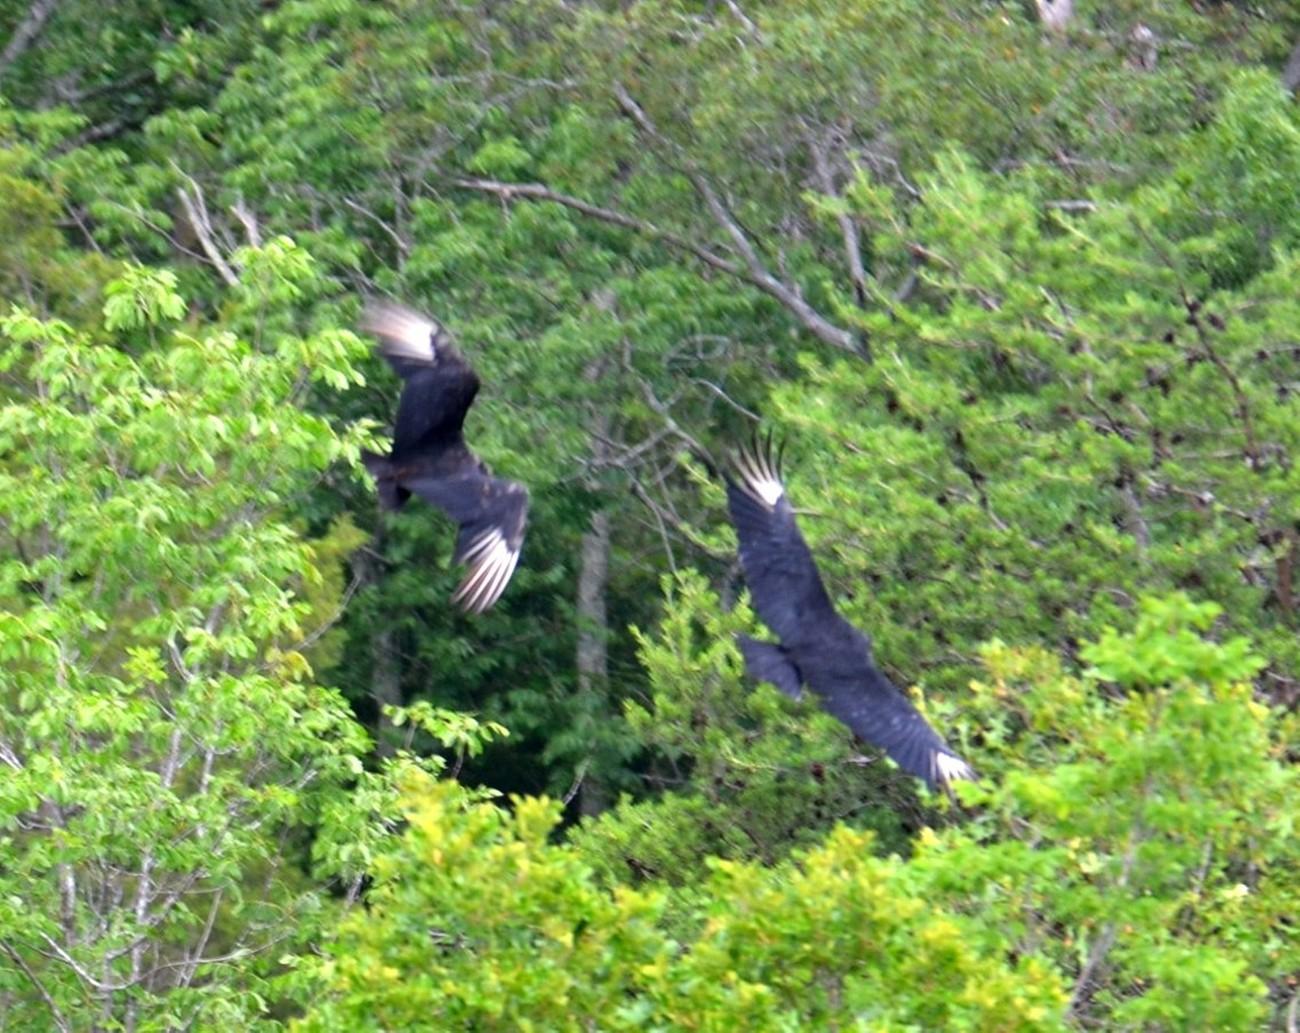 Great Falls, National Park, Great Falls, Maryland